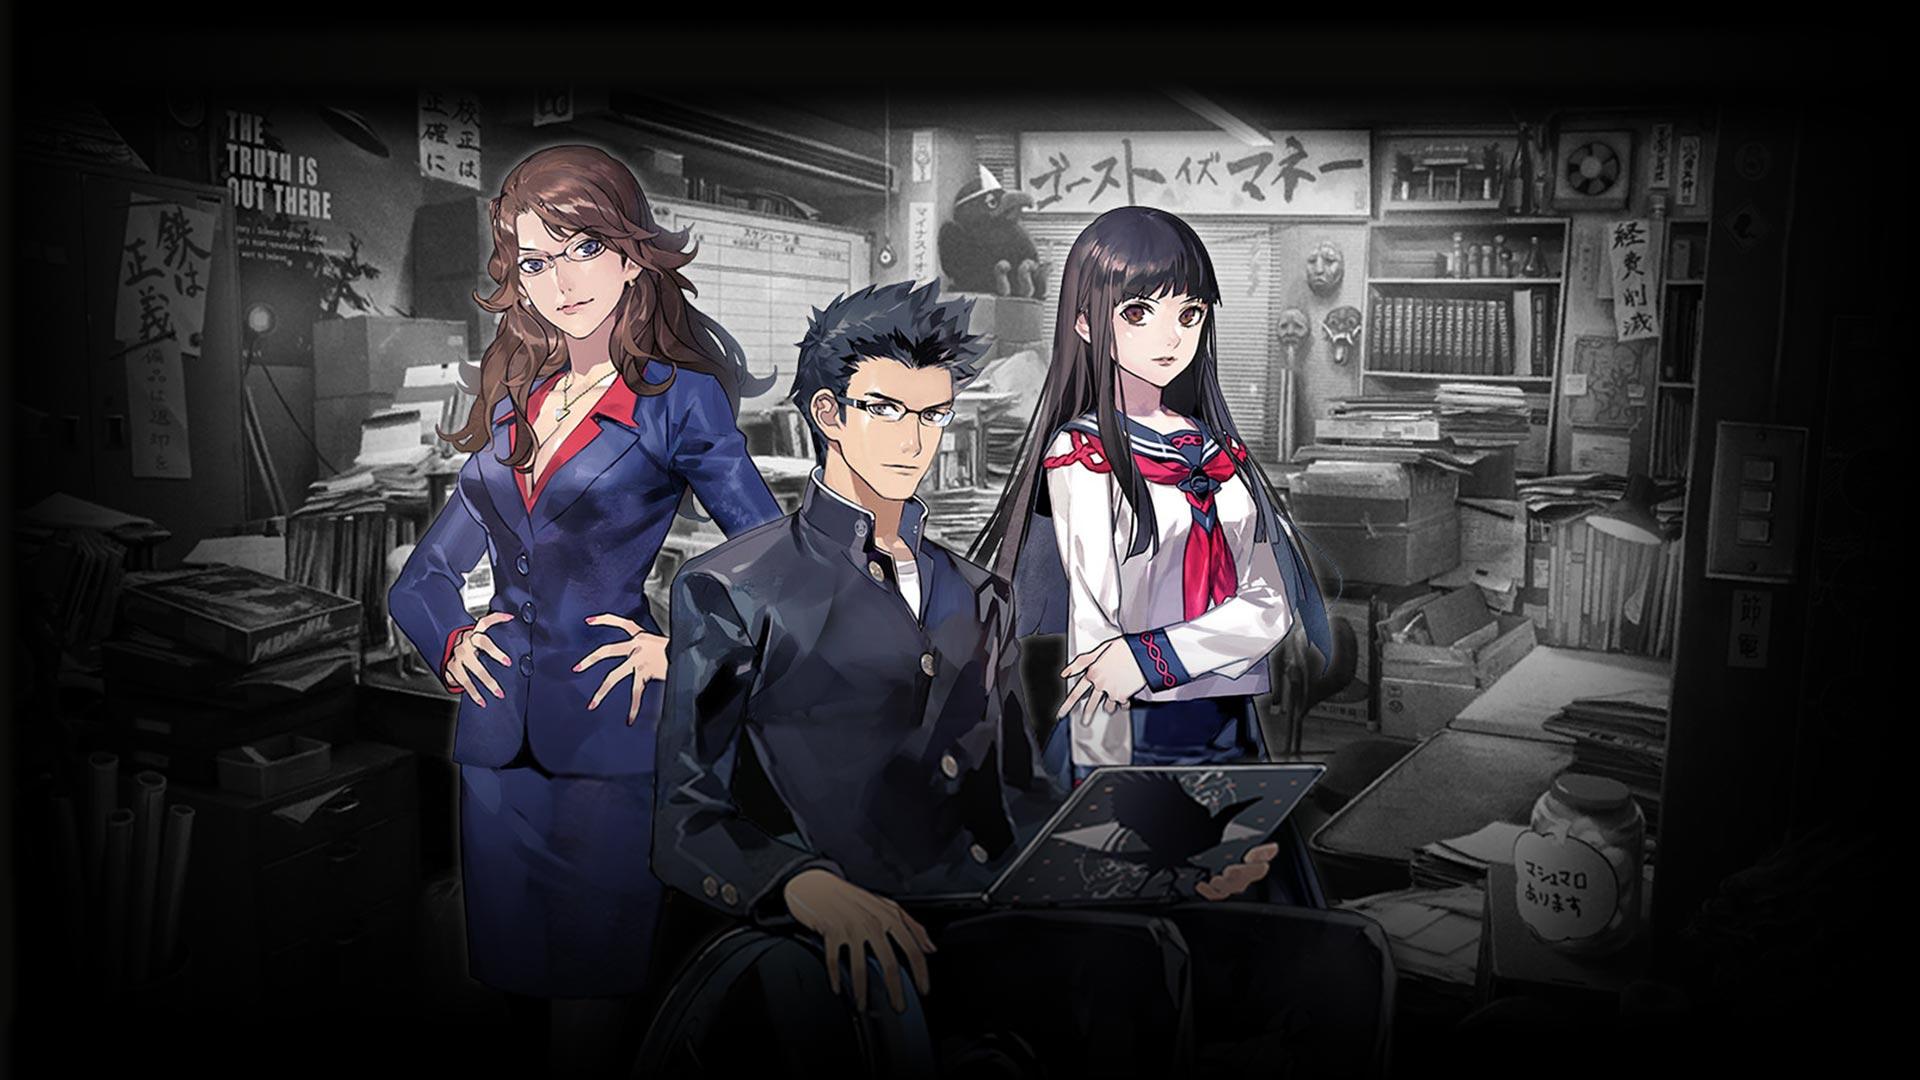 Modojo | Tokyo Twilight Ghost Hunters